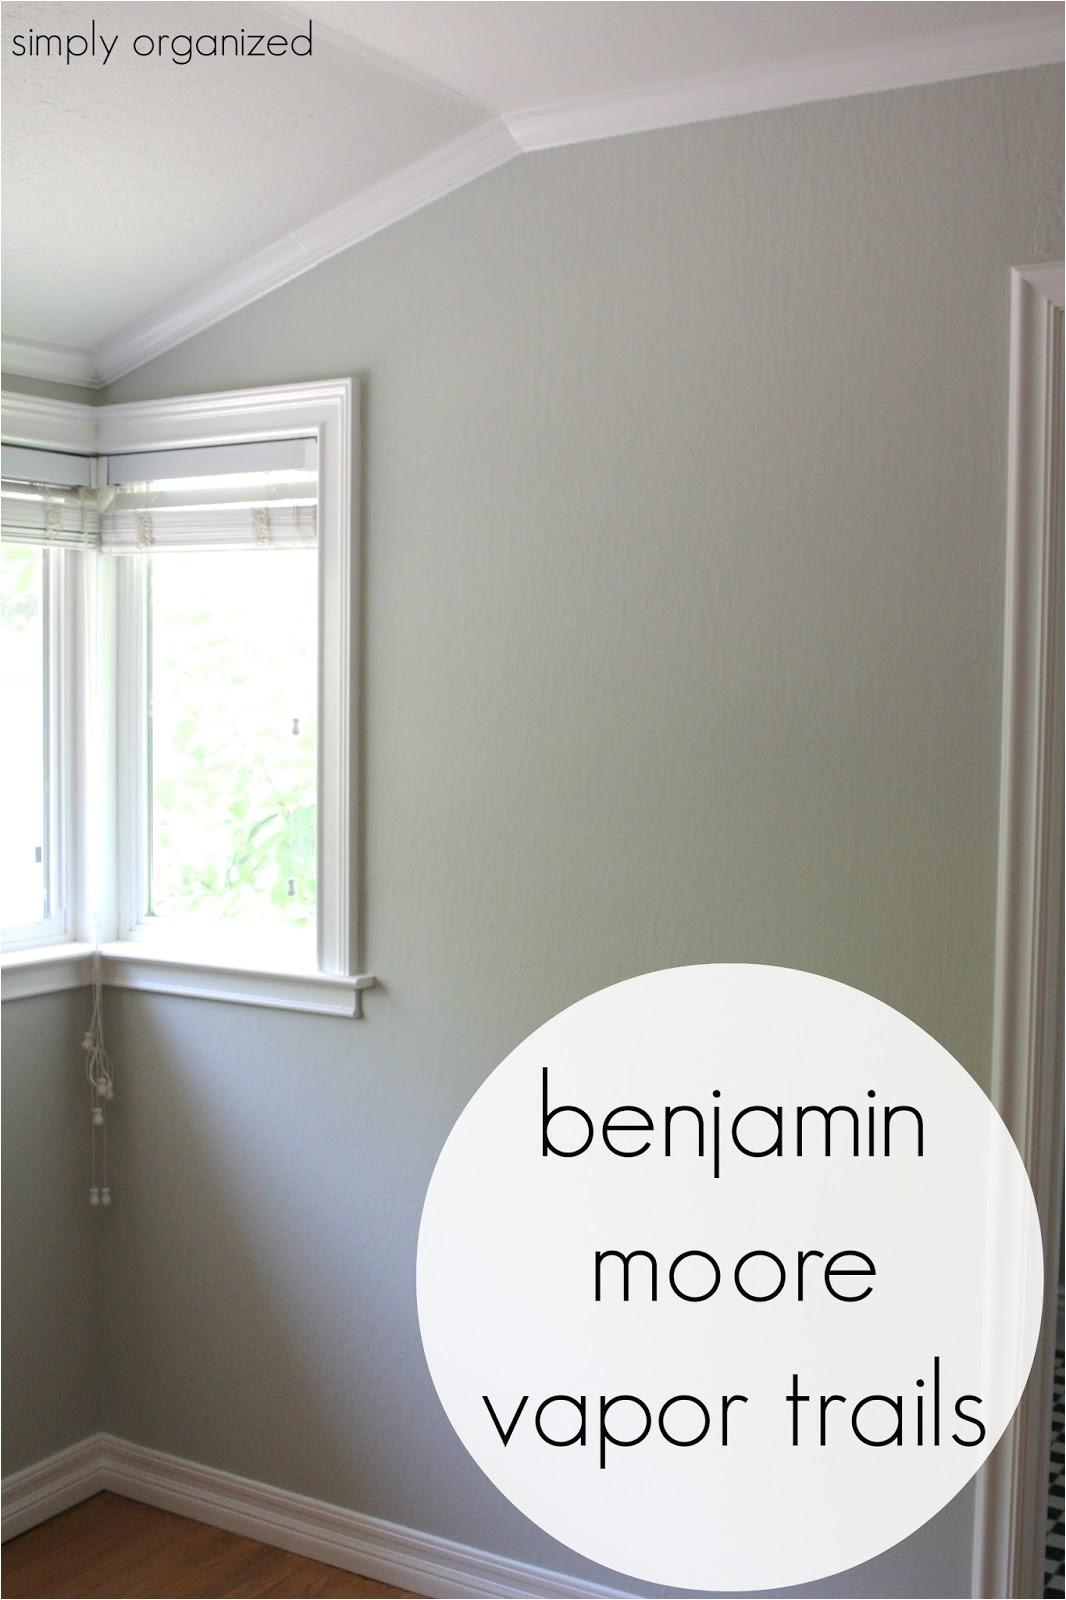 Benjamin Moore Vapor Trails Undertones My Home Interior Paint Color Palate Simply organized